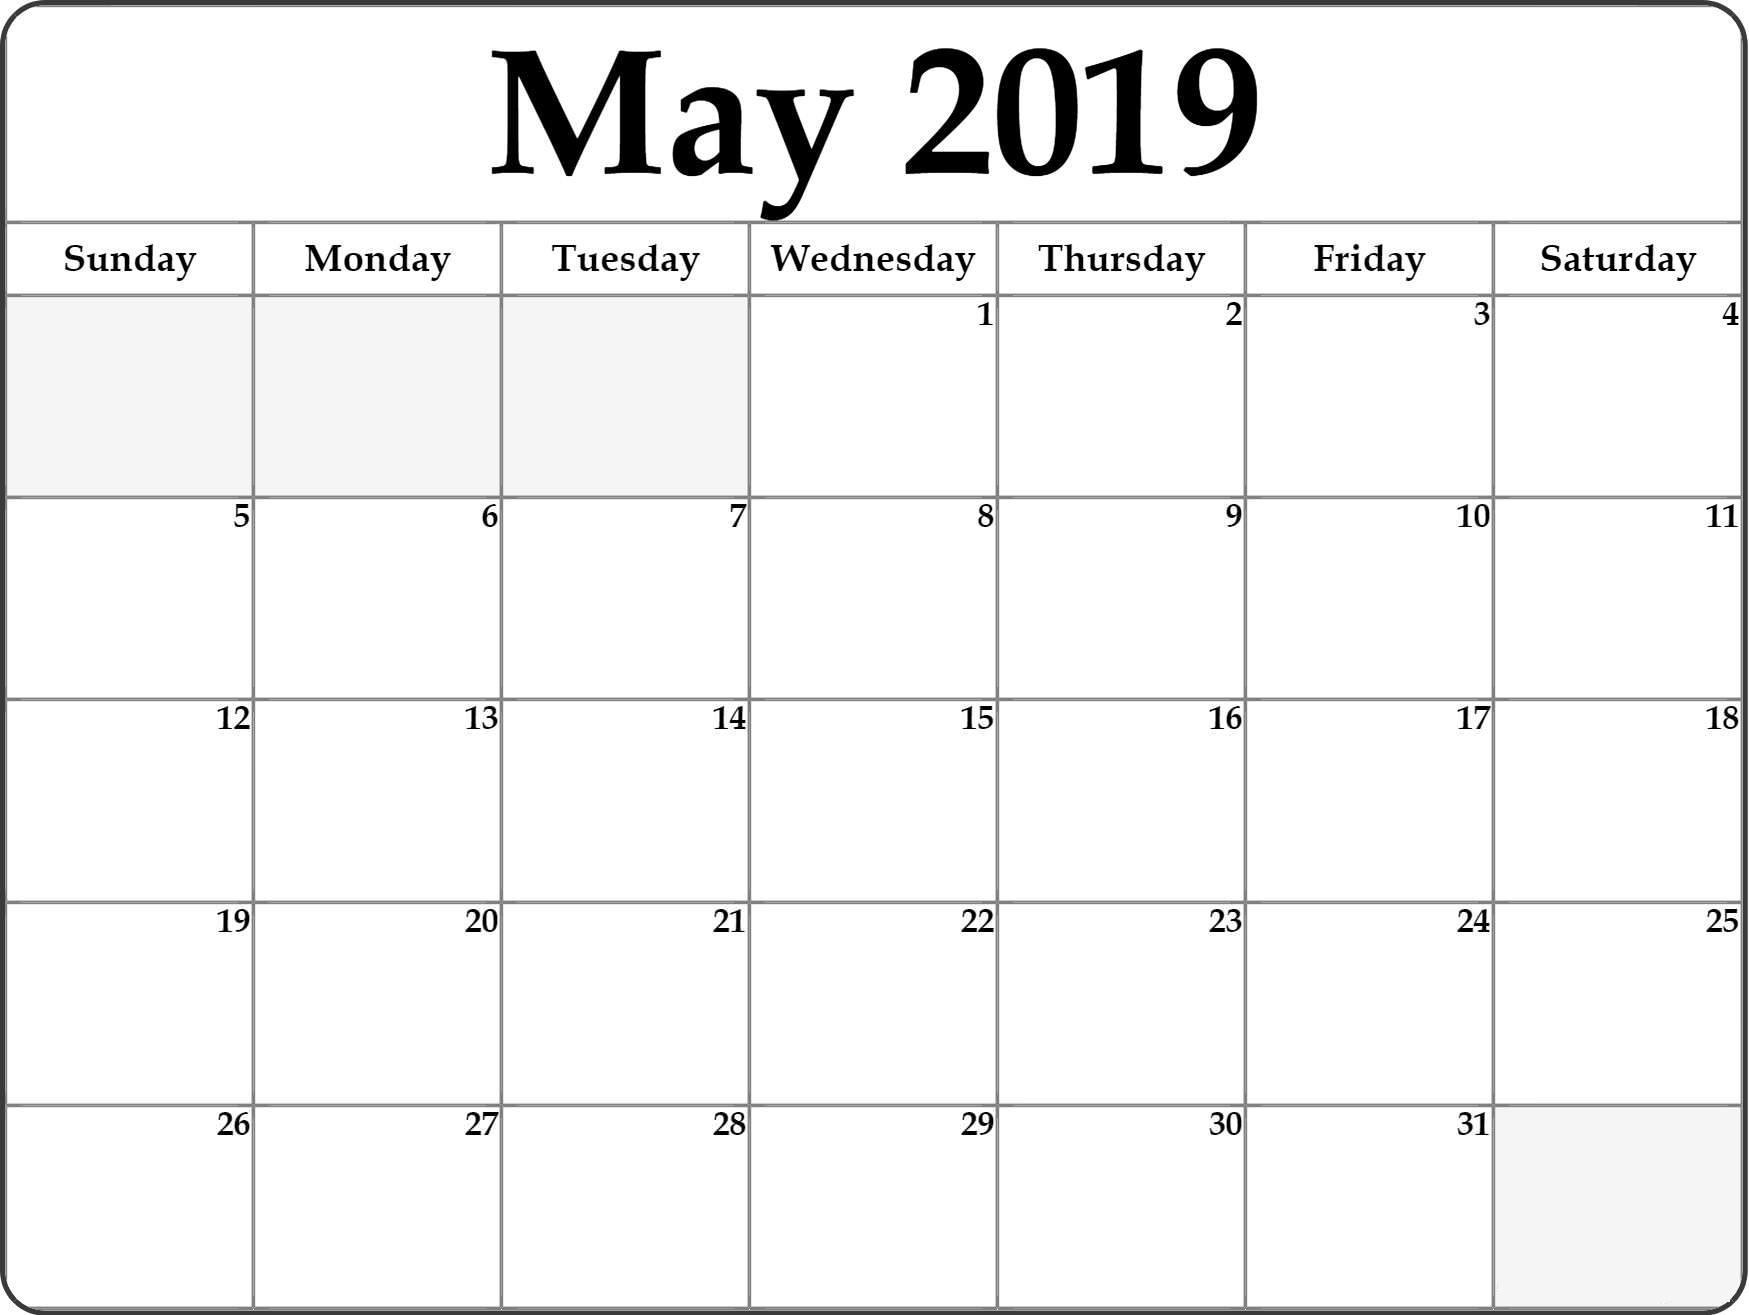 May Calendar 2019 Printable Free Template - Free Printable Calendar for Calendar Printable Free Template